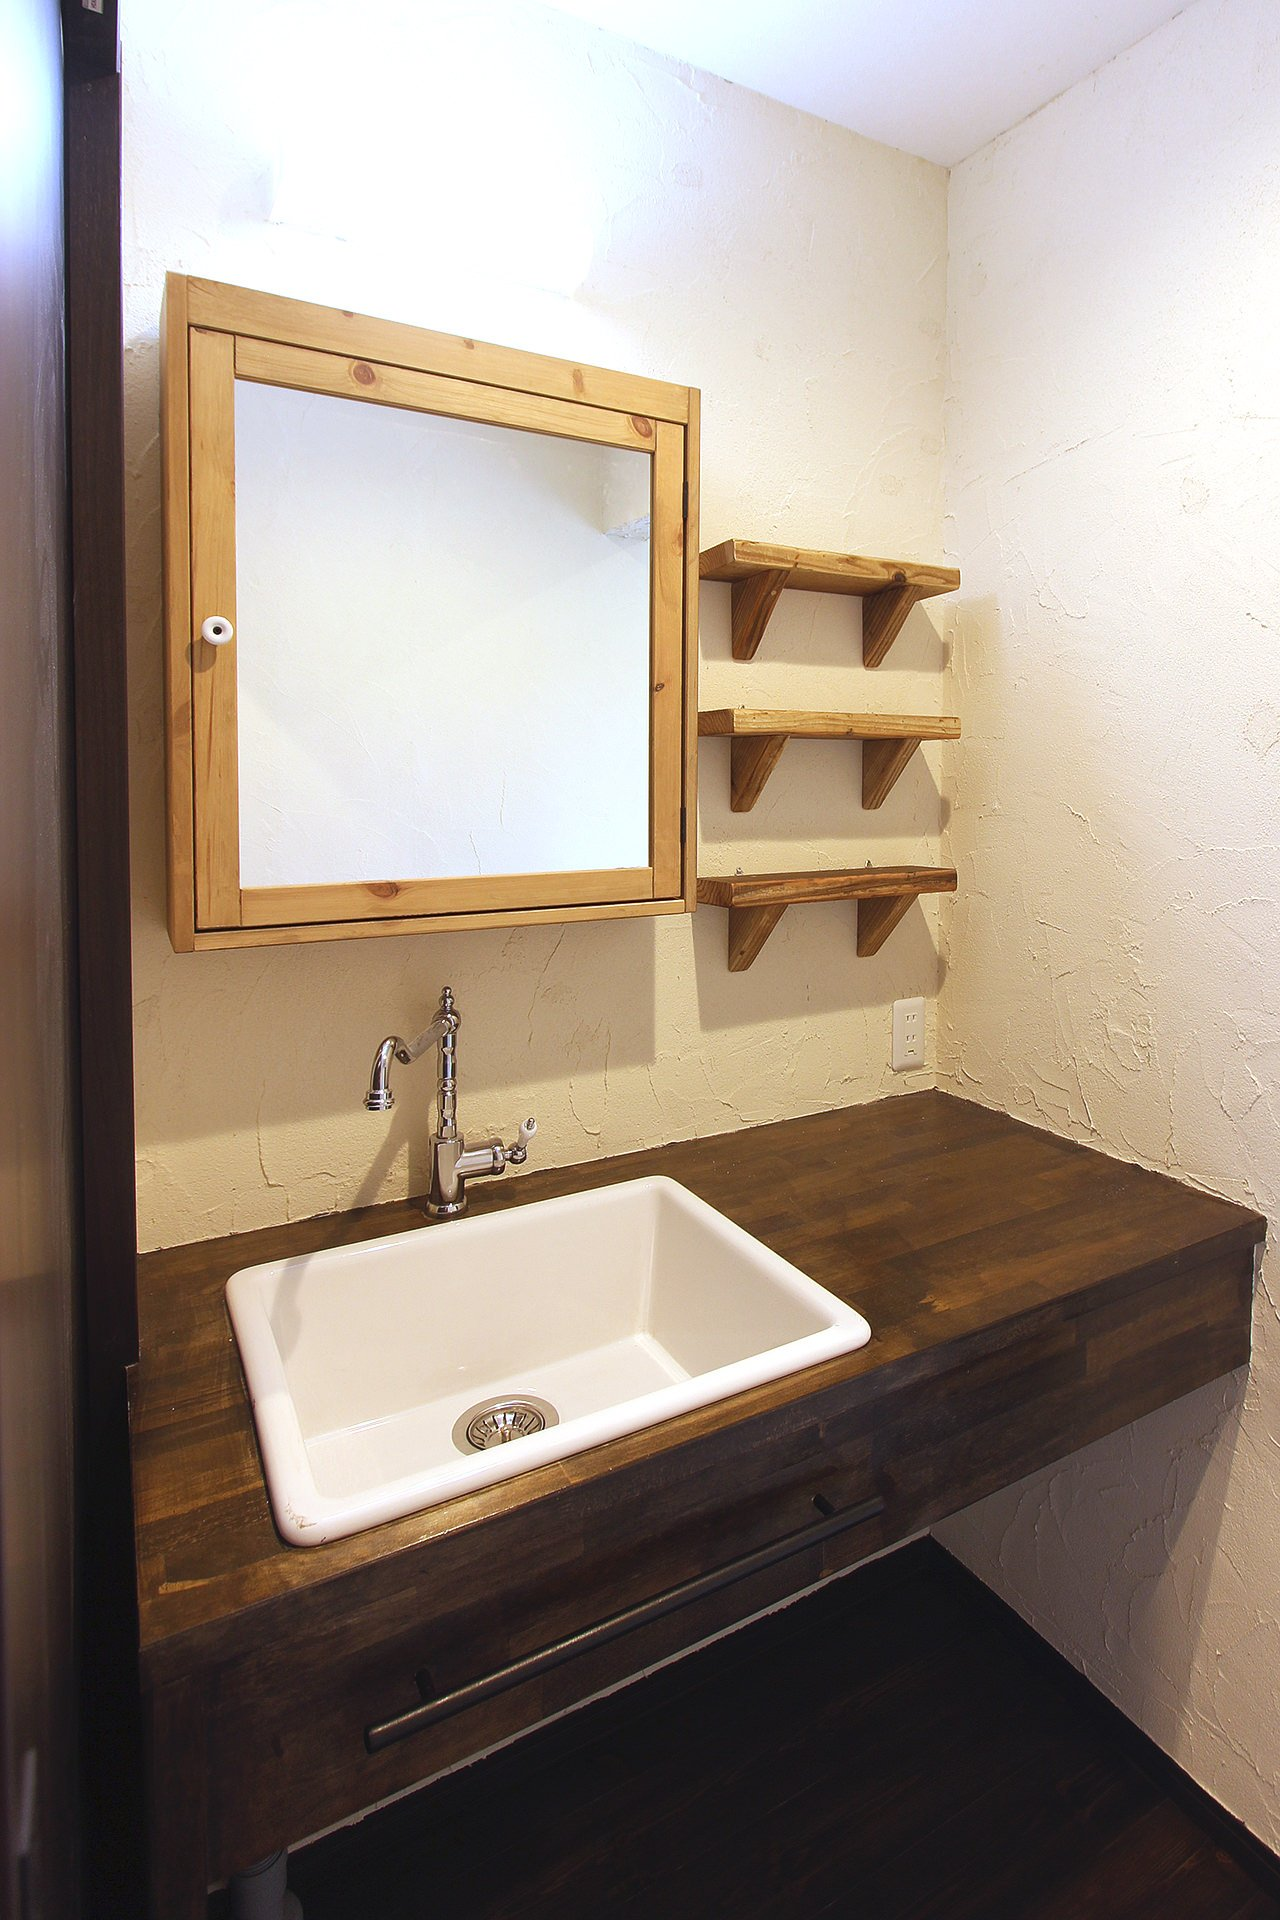 IKEA 洗面台 イメージ에 대한 이미지 검색결과